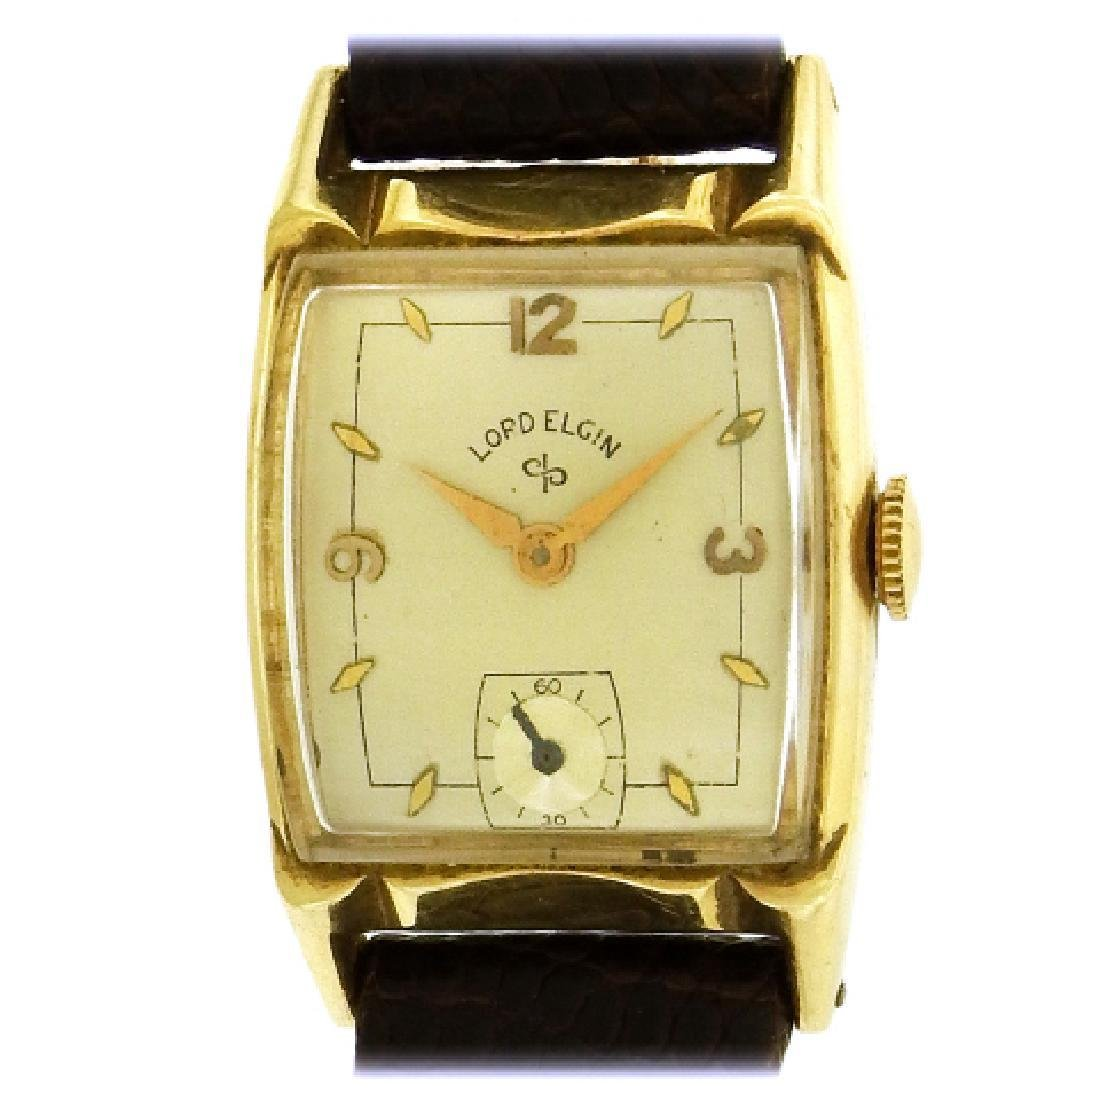 Lord Elgin Vintage 14k Yellow Gold C 1940 Watch